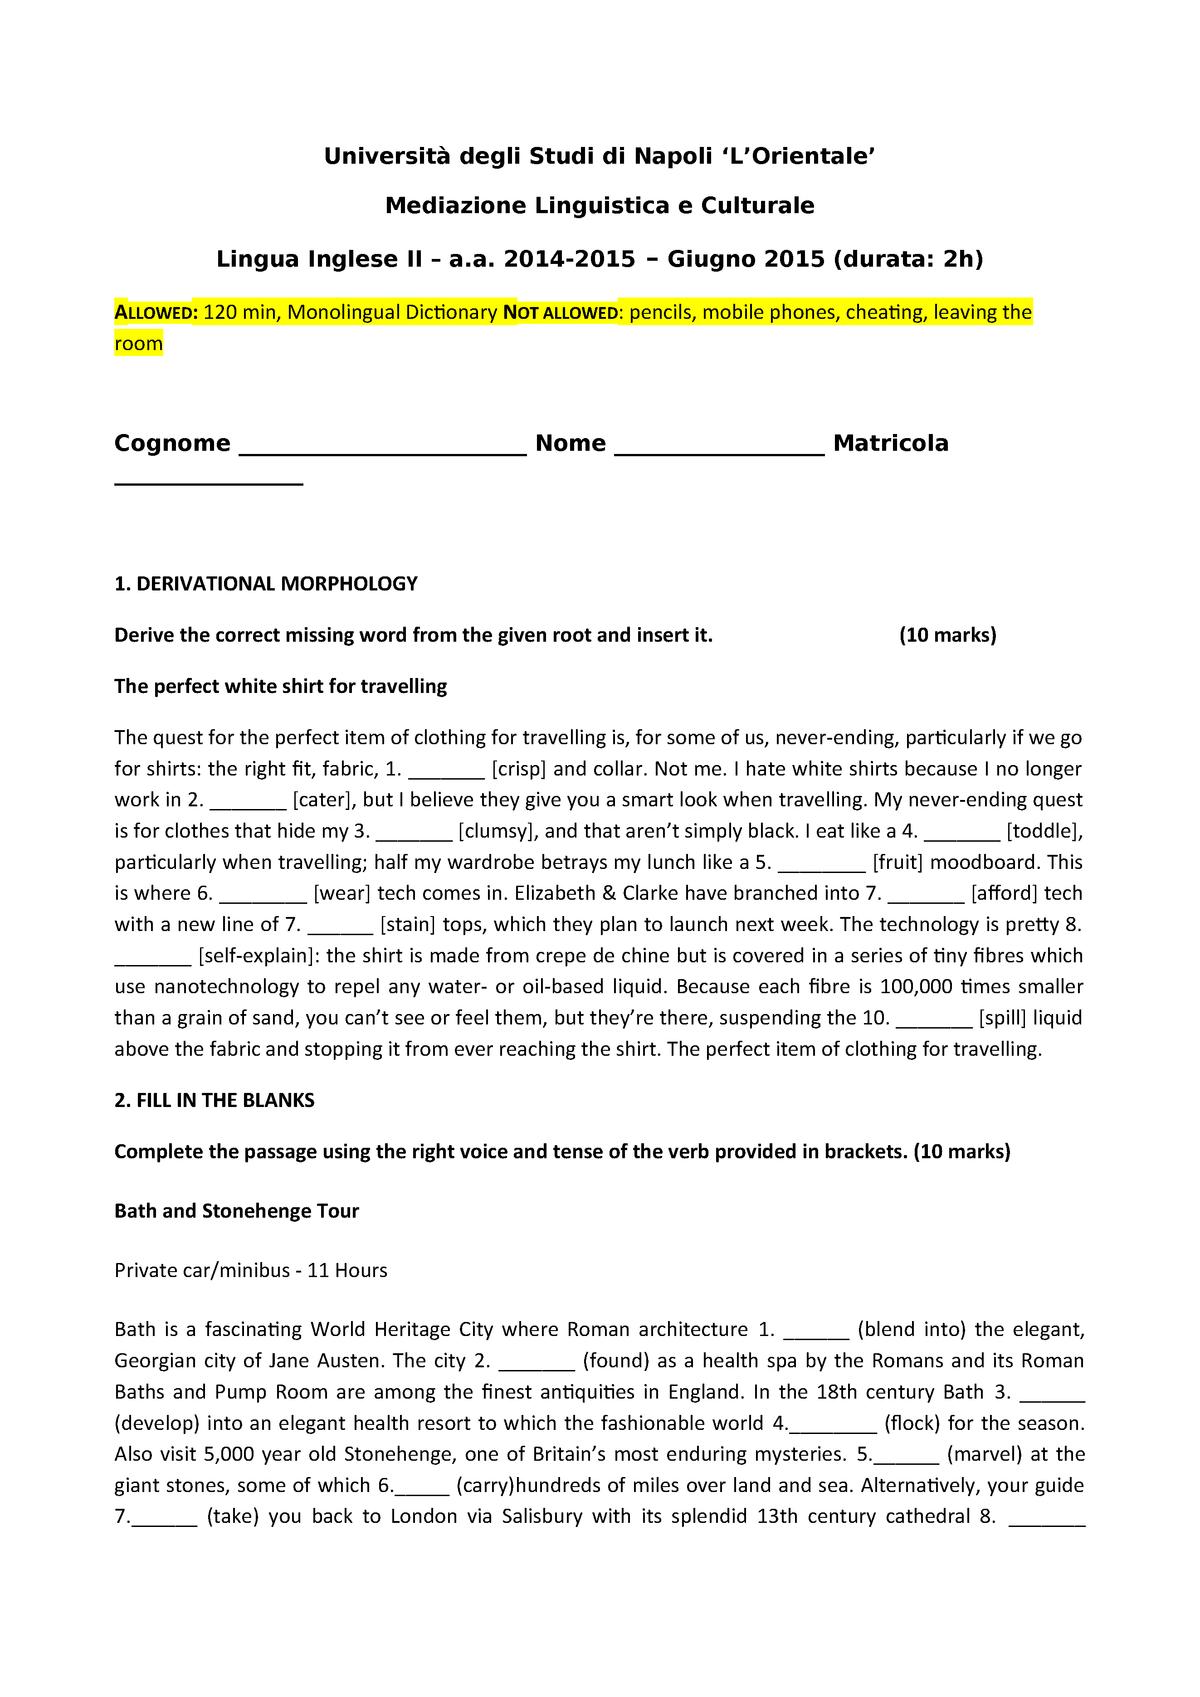 Exam 2015 - Letteratura Inglese II - StuDocu